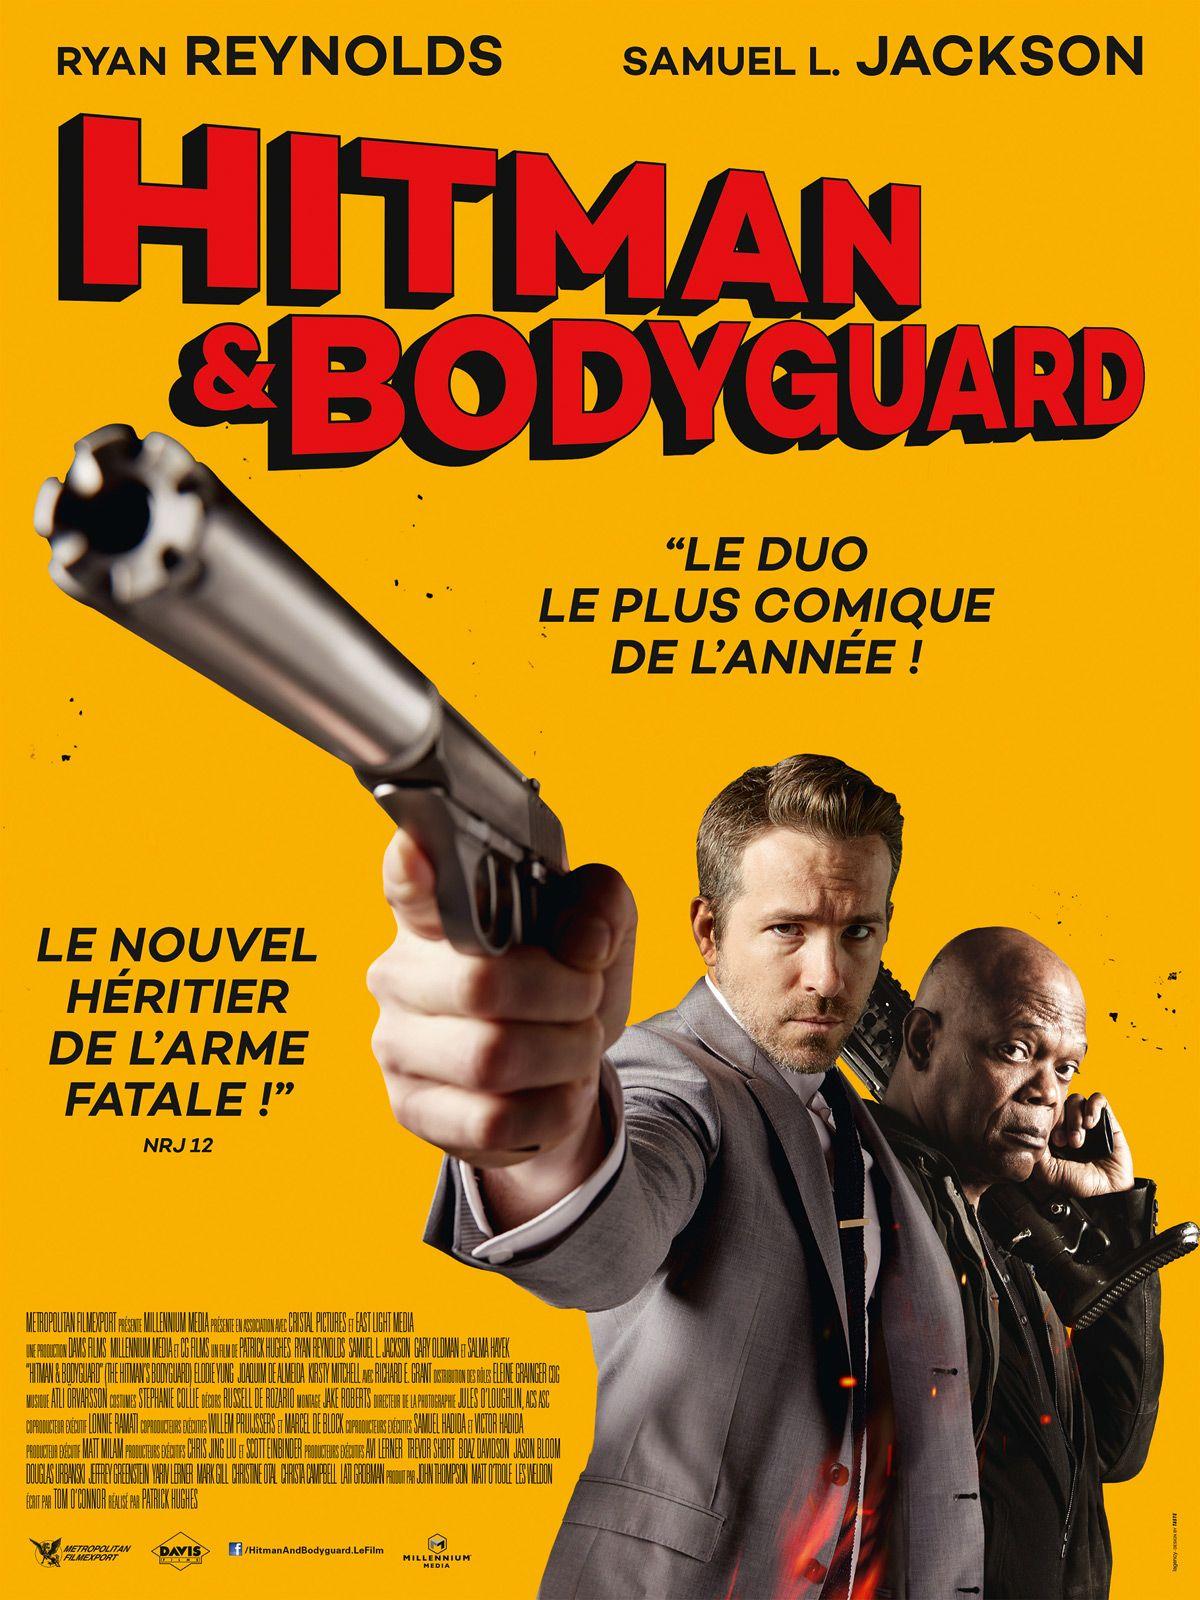 hitman bodyguard film 2017 allocin movies tv shows netflix cartoons animes. Black Bedroom Furniture Sets. Home Design Ideas